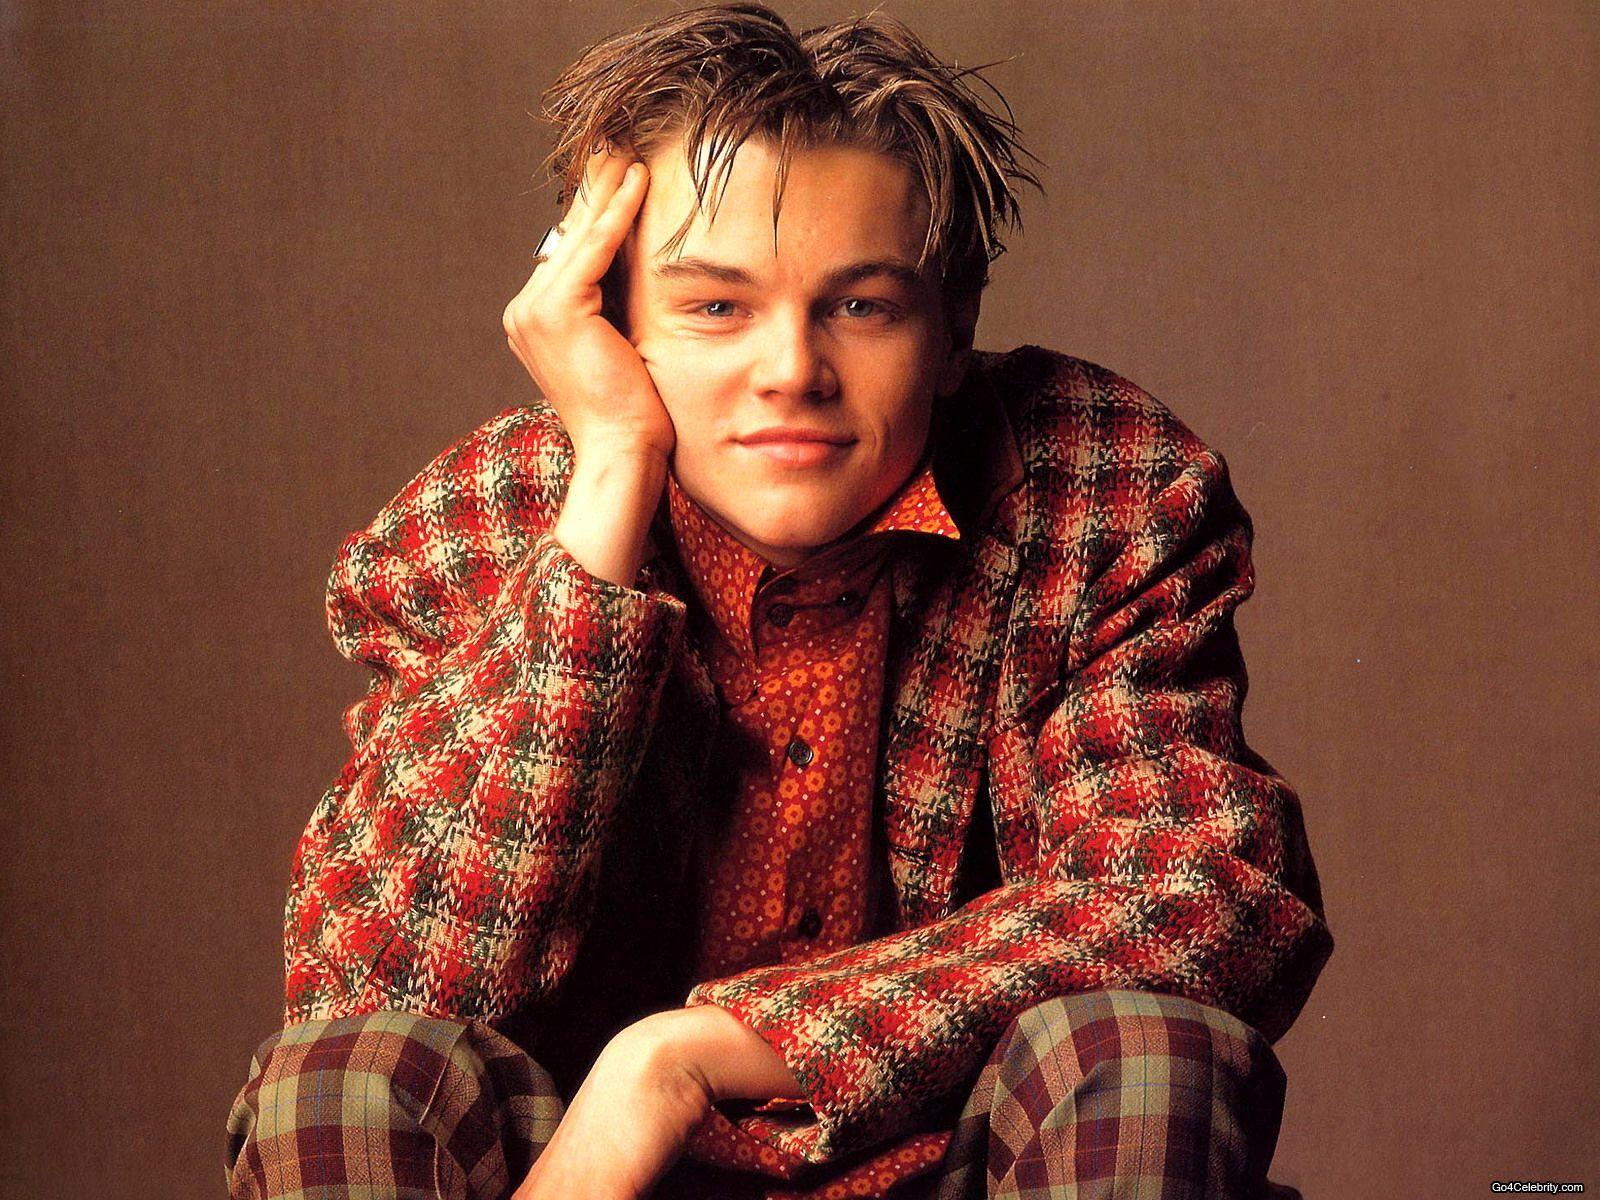 Leonardo DiCaprio в клетчатом луке